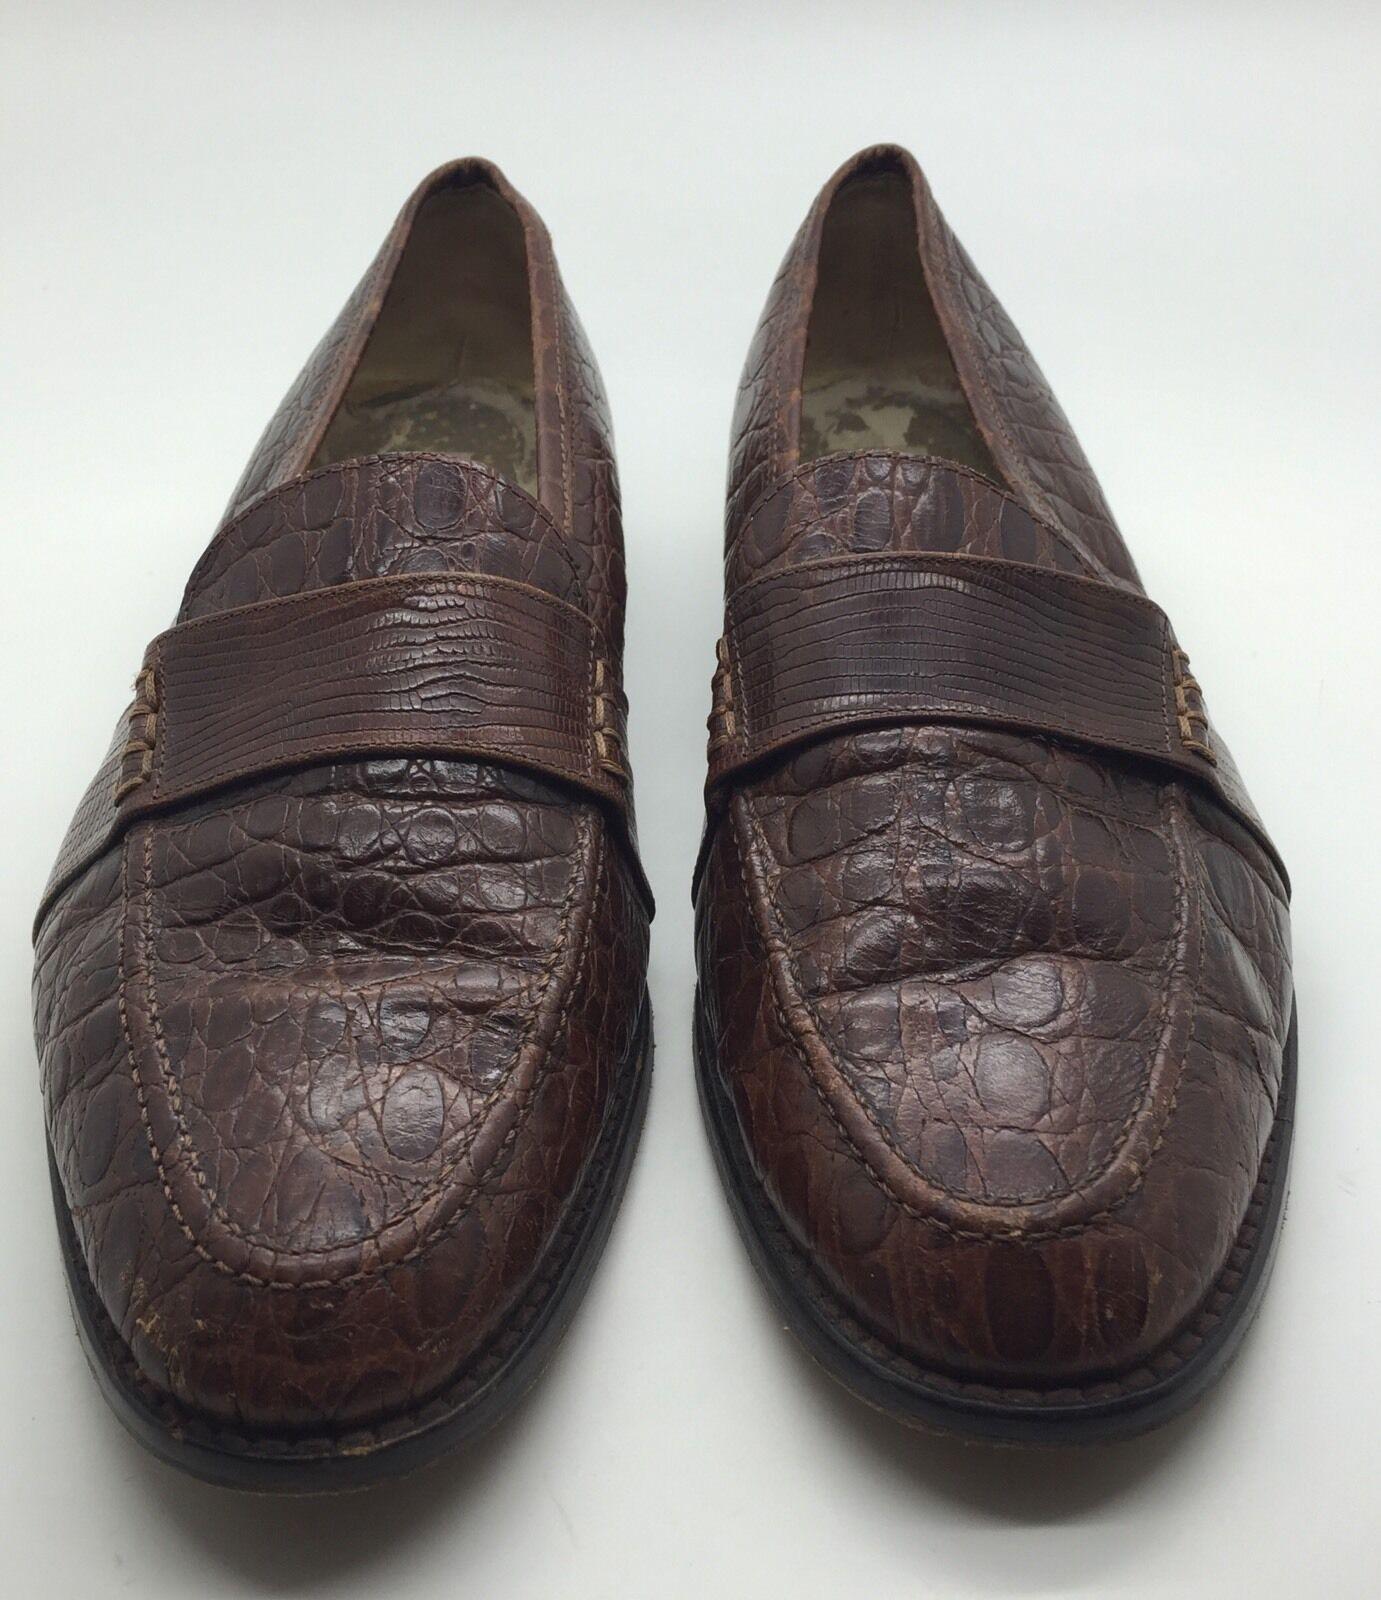 GRUPPO ITALIANO Brown Crocodile Skin Classic Penny Loafers Men's 7.5C ITALY Nice